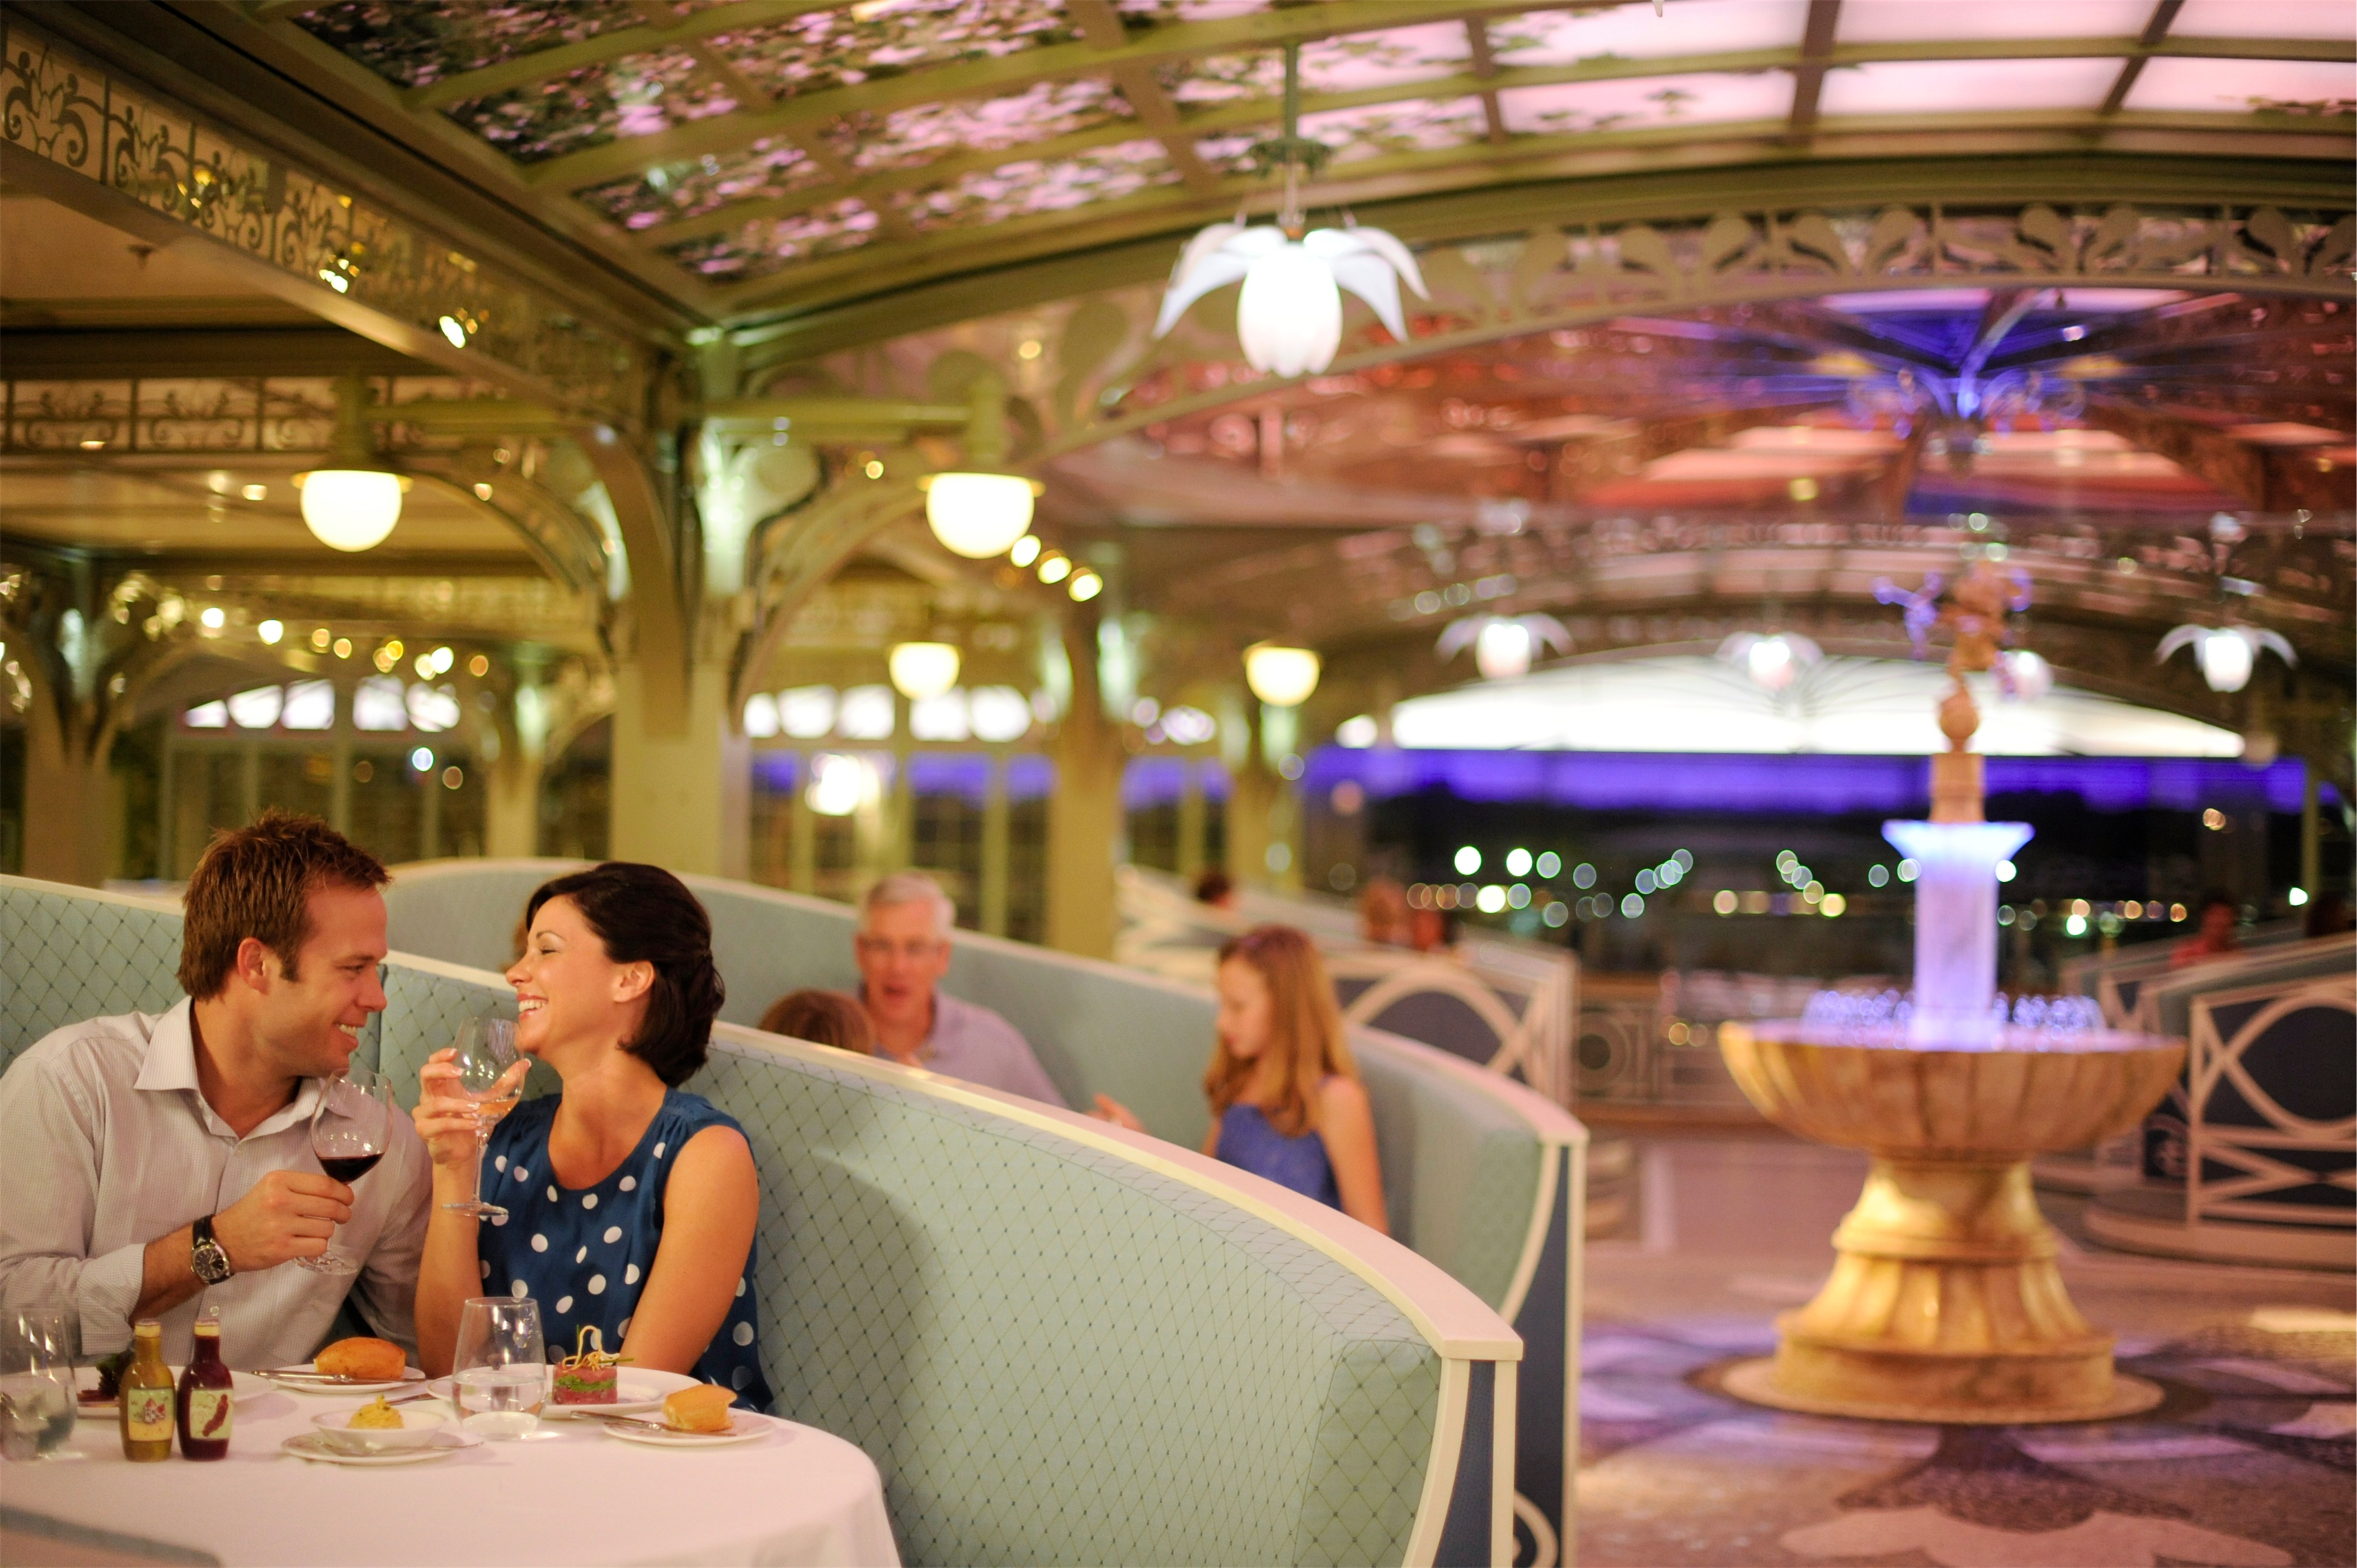 Disney Cruise Line Disney Dream Interior Enchanted Garden Restaurant 2.jpg